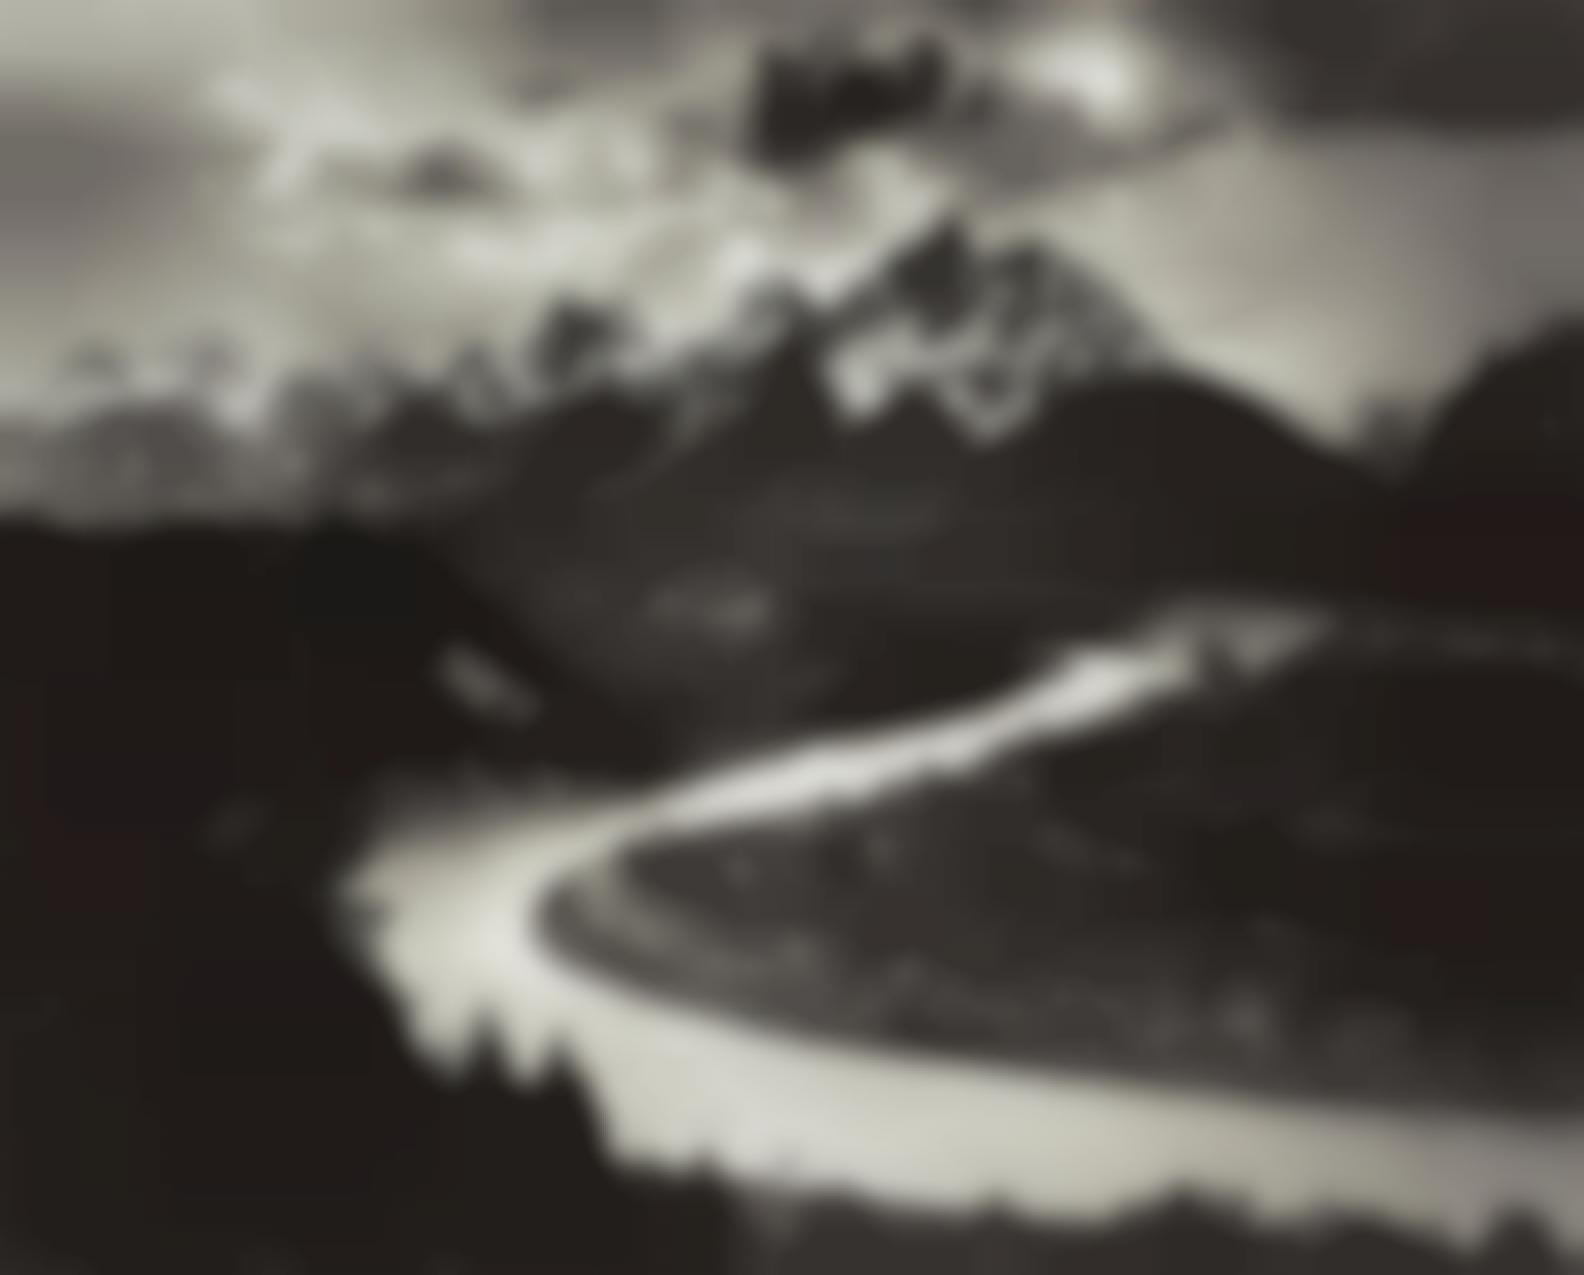 Ansel Adams-The Tetons And The Snake River, Grand Teton National Park, Wyoming-1942